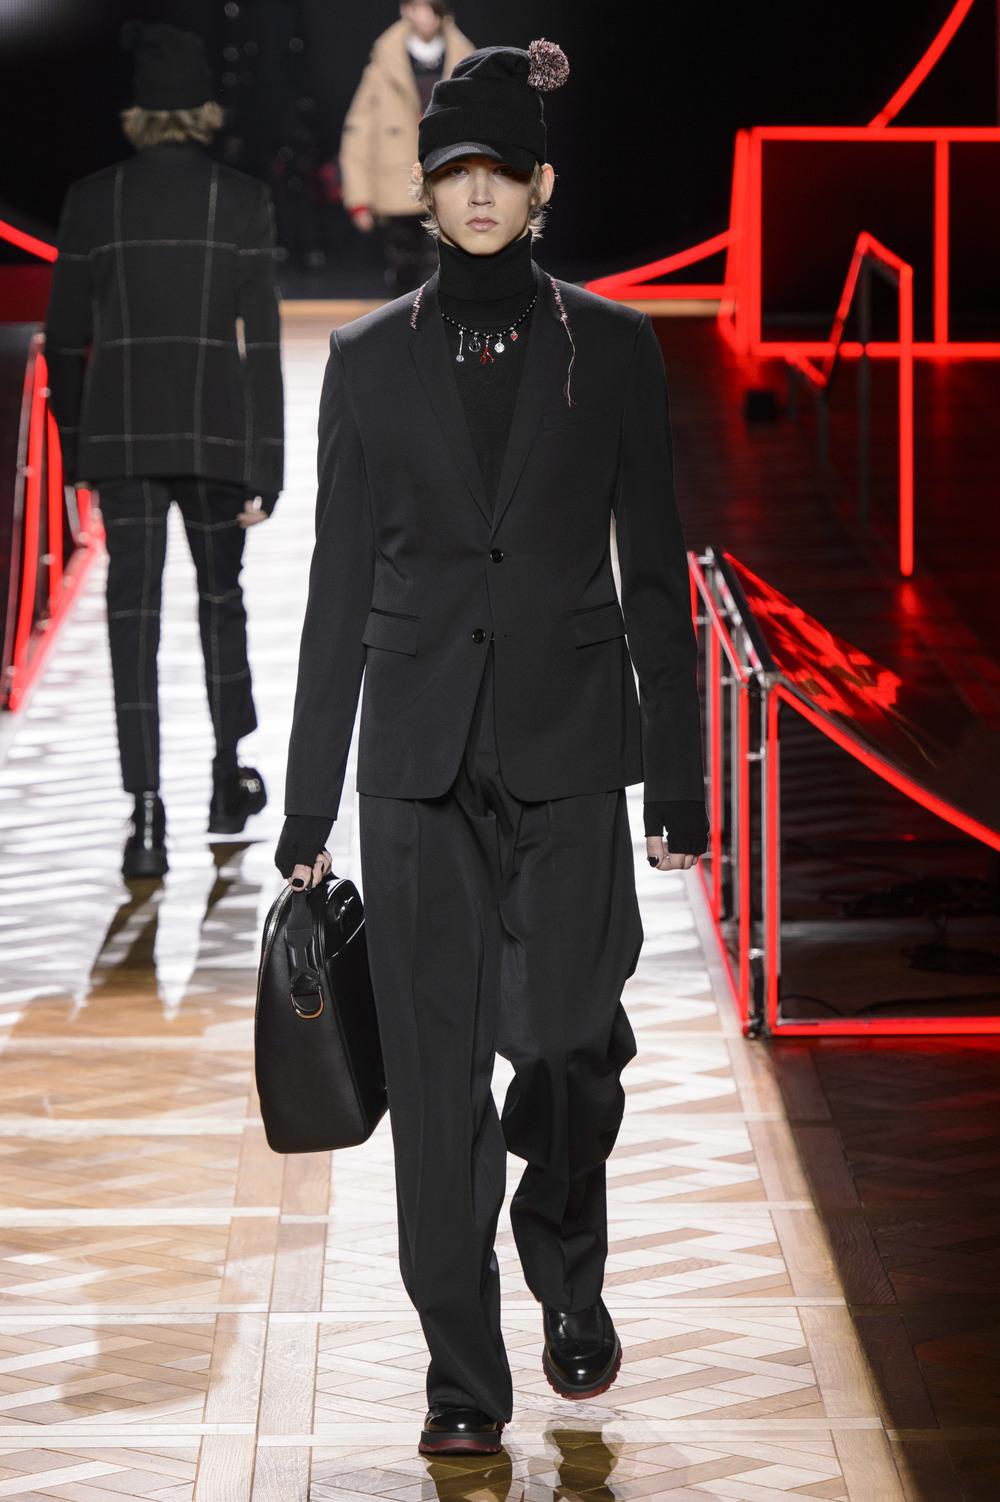 Dior_Homme_Hiver2016-17_look_27.JPG